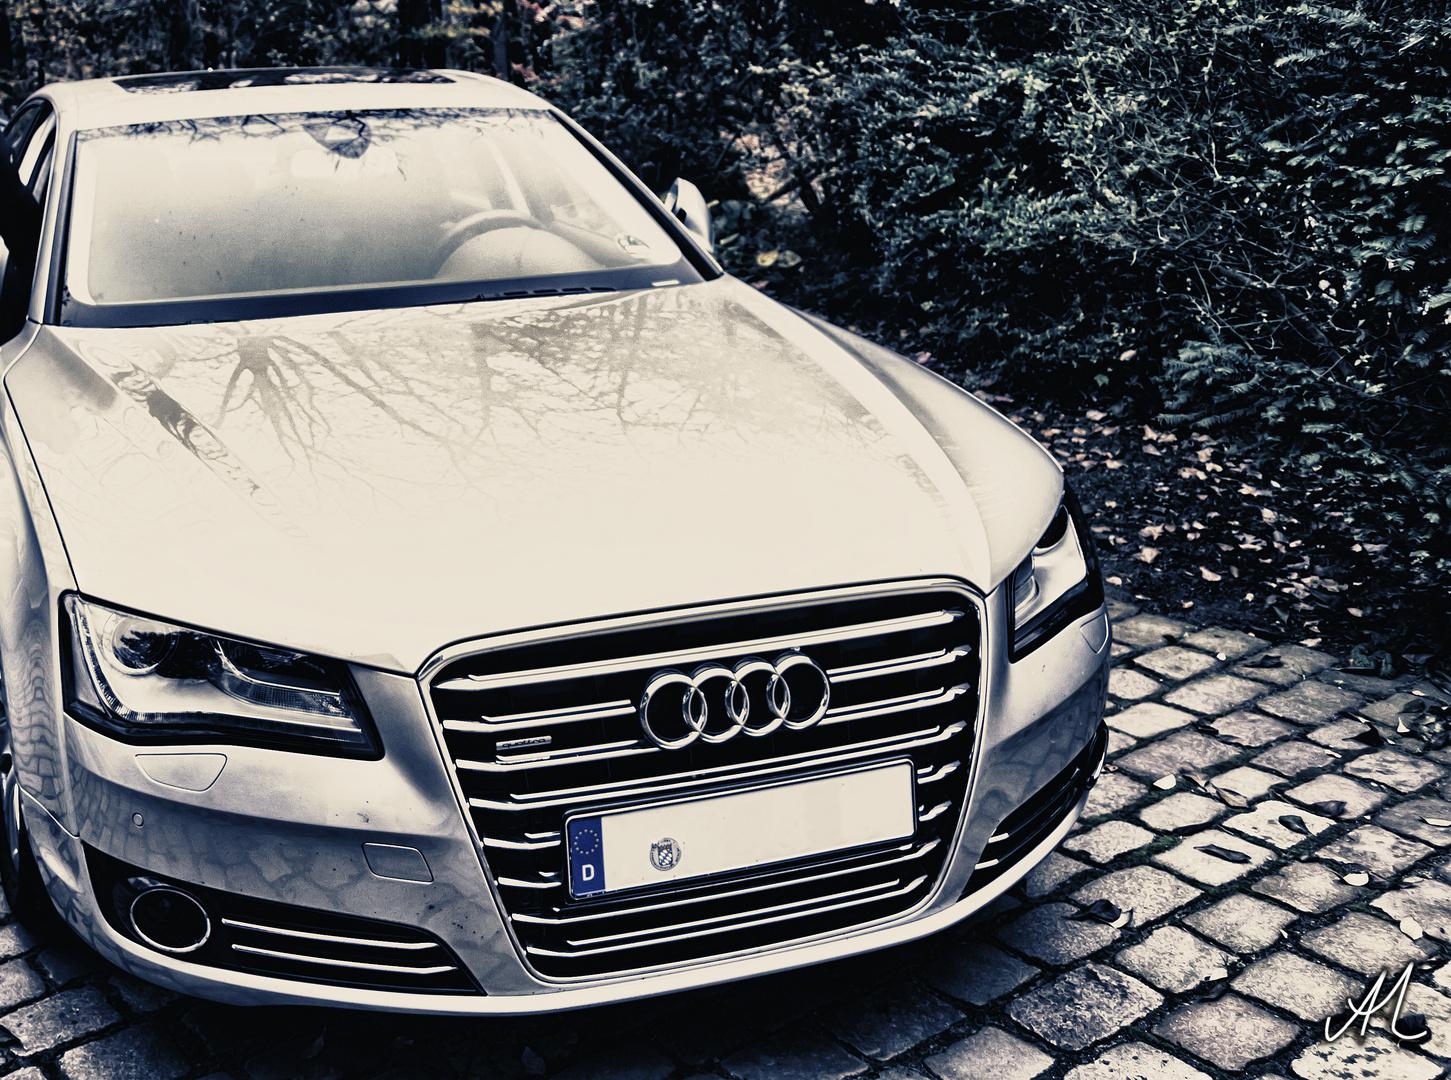 Audi A8 4,2 L V8 TDI 350 PS